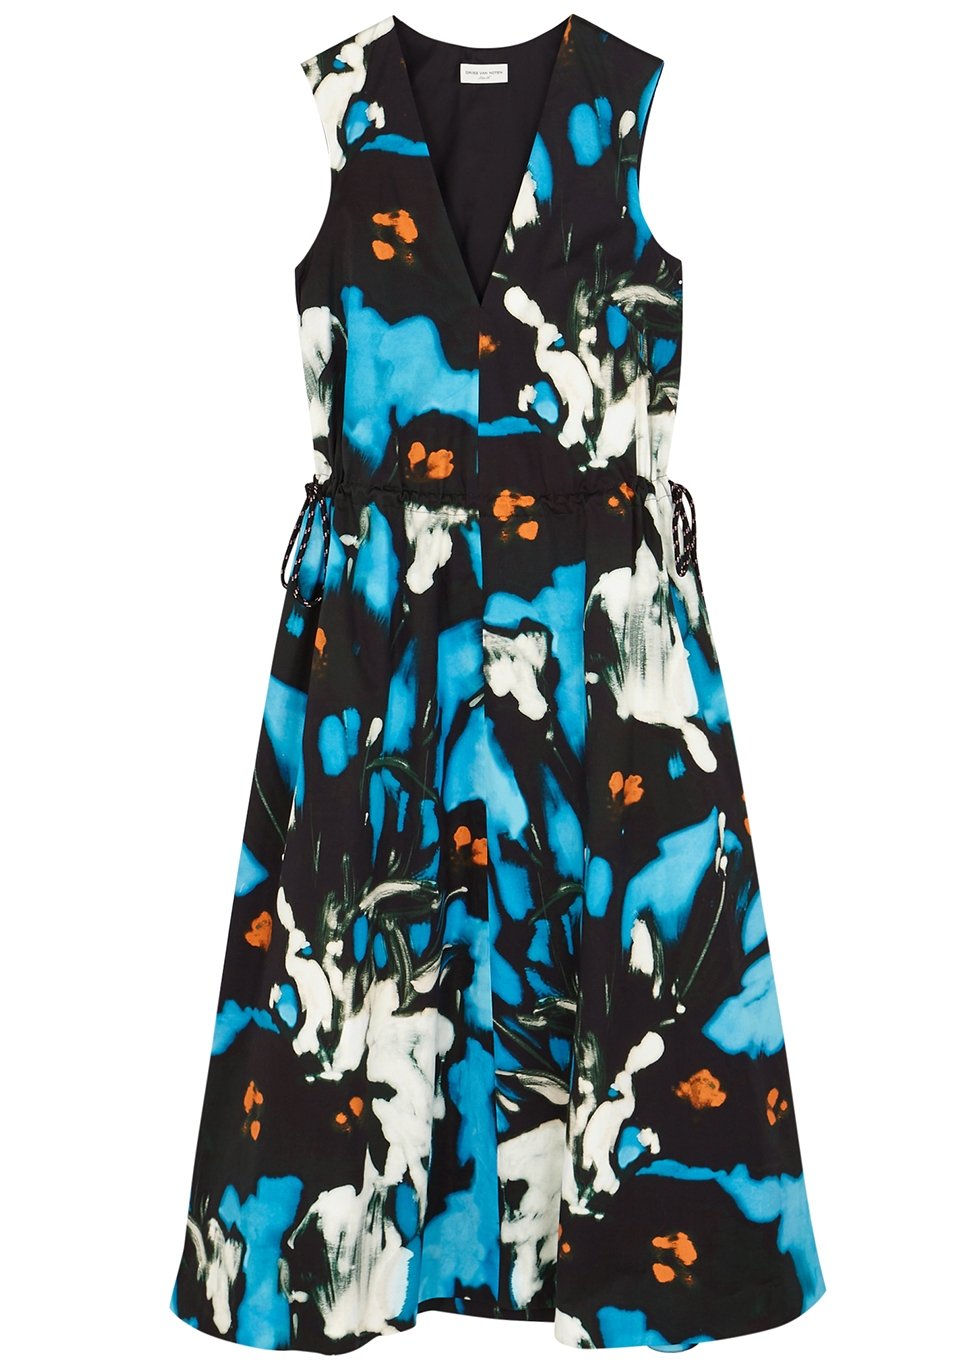 Dampin printed cotton midi dress - Dries Van Noten